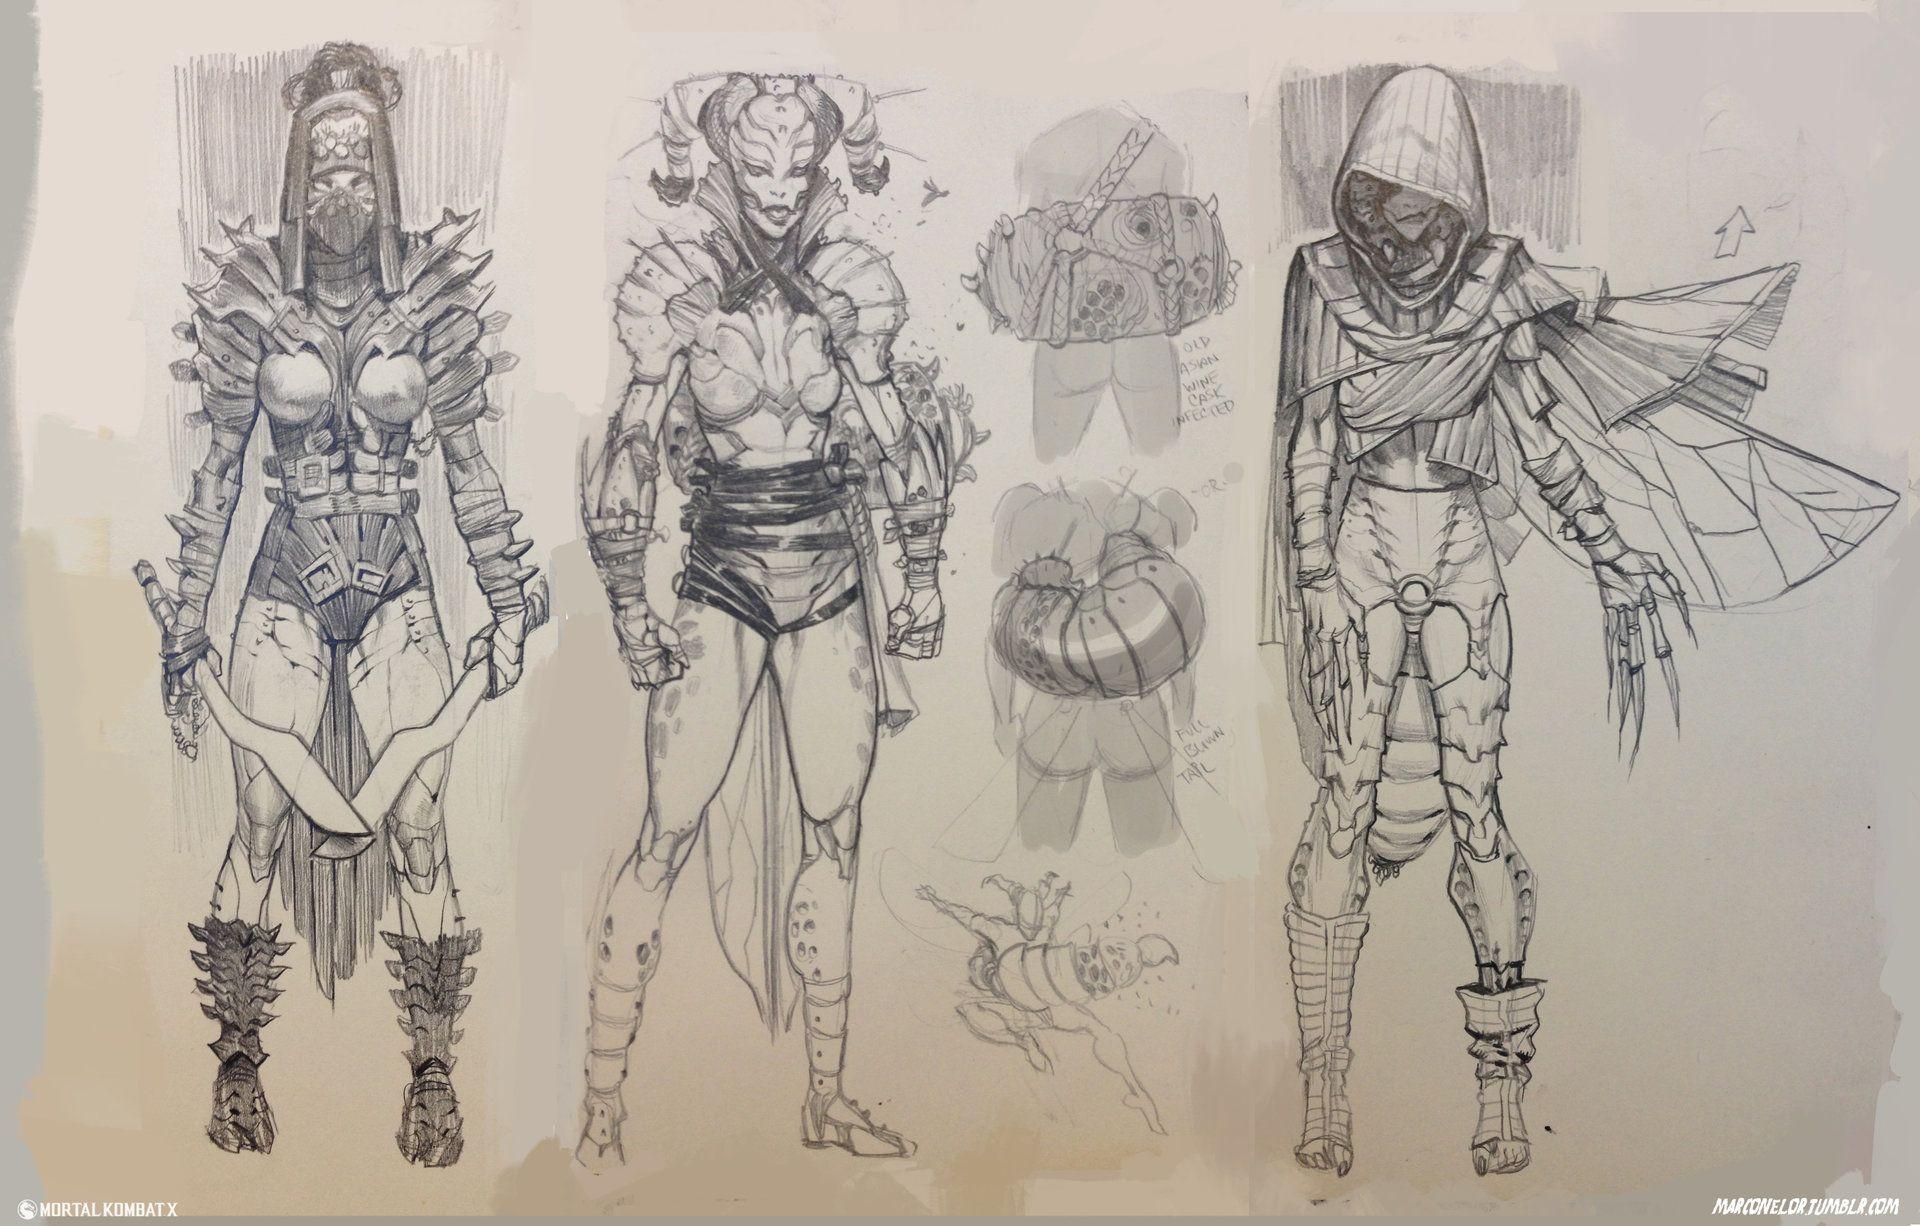 D Line Drawing Game : Mortal kombat x концепты: 22 тыс изображений найдено в Яндекс